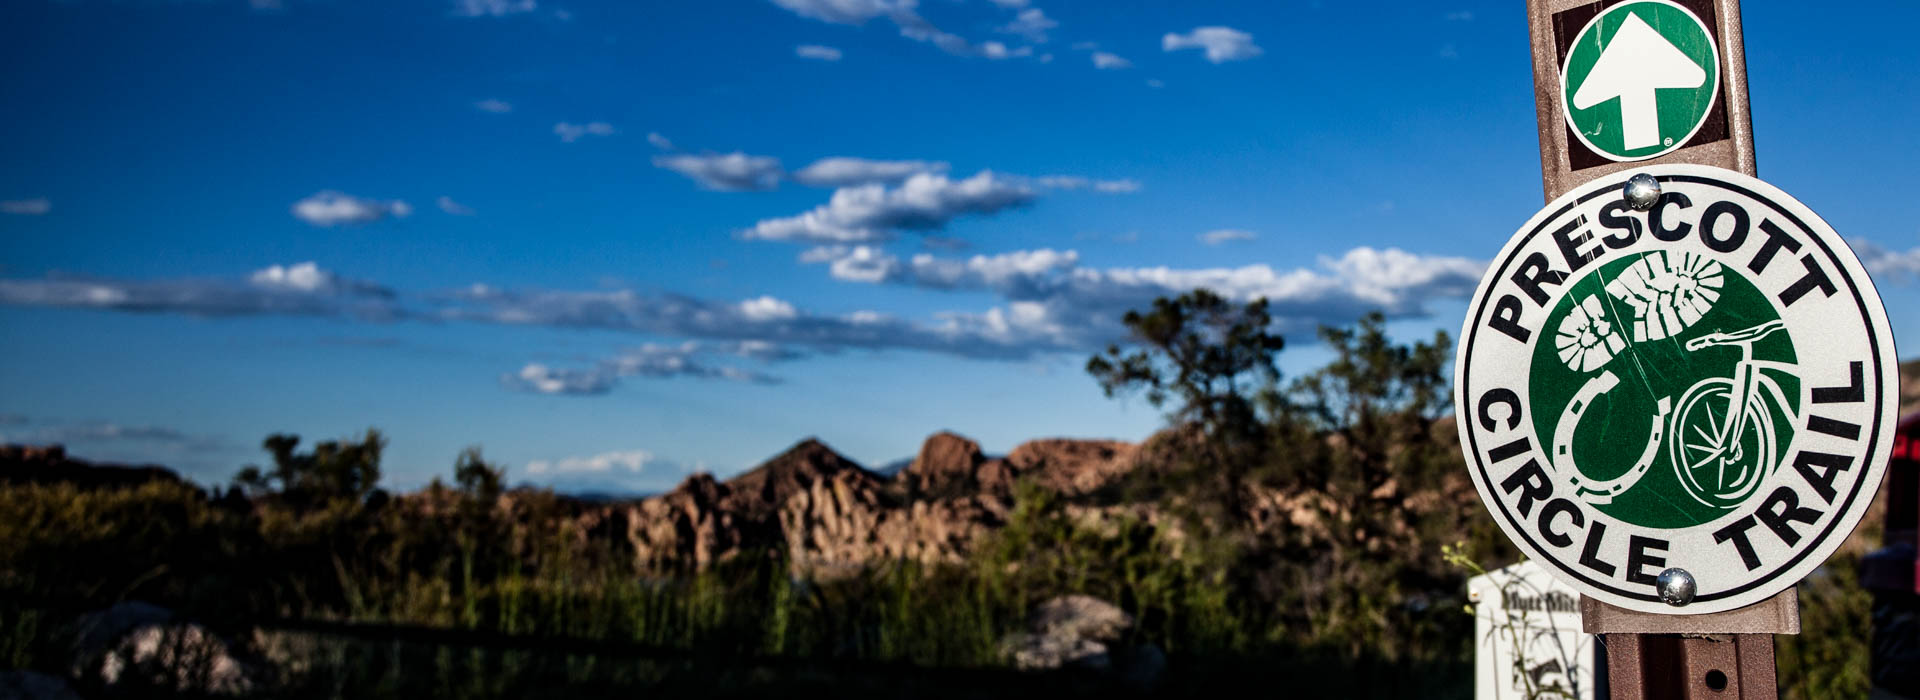 Prescott AZ Circle Trail Photographer Rich Charpentier